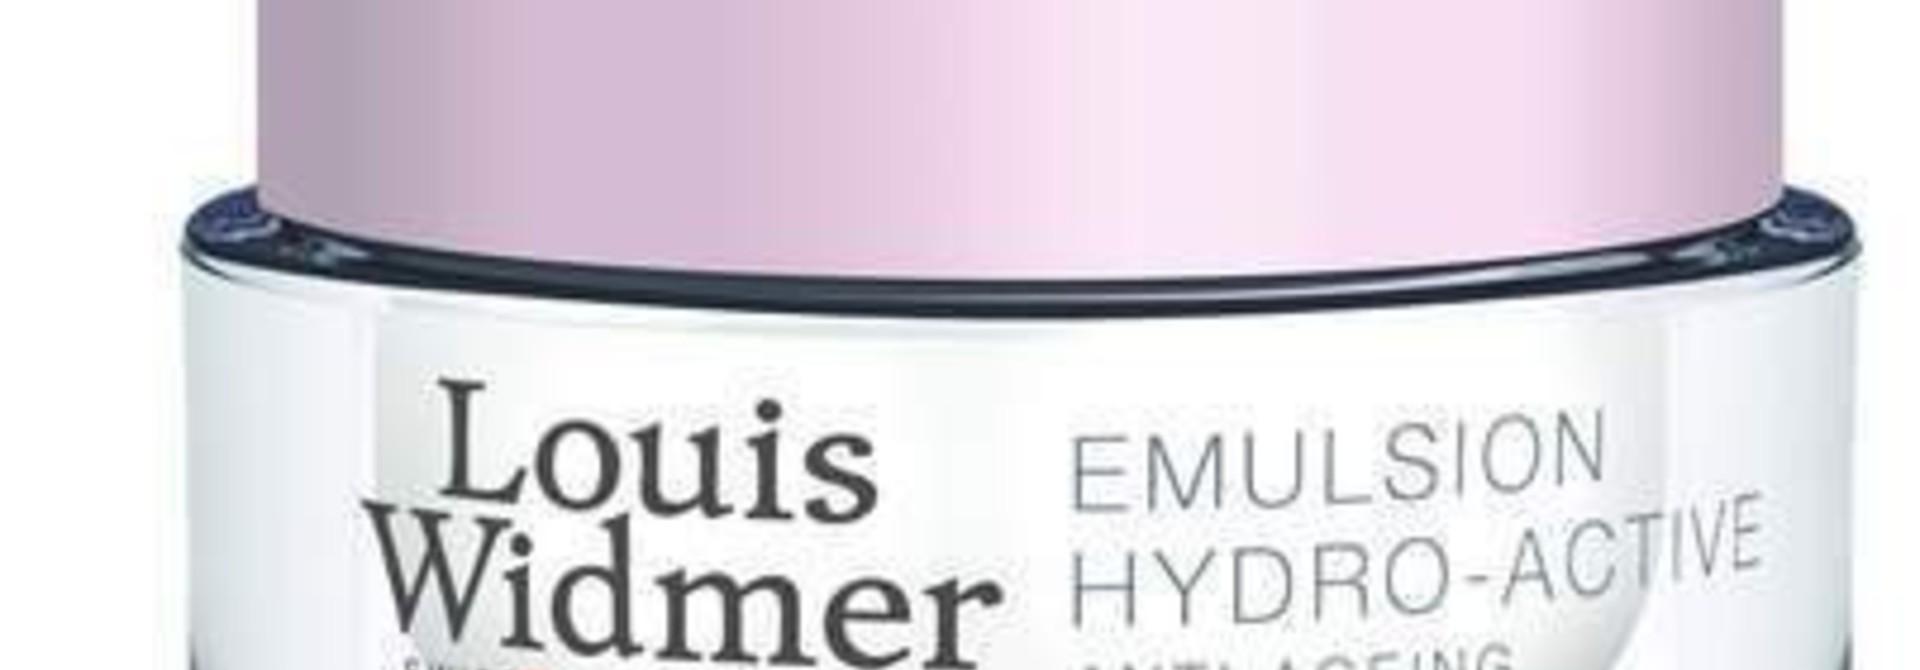 Emulsion Hydro-Active UV 30 50 ml ongeparfumeerd